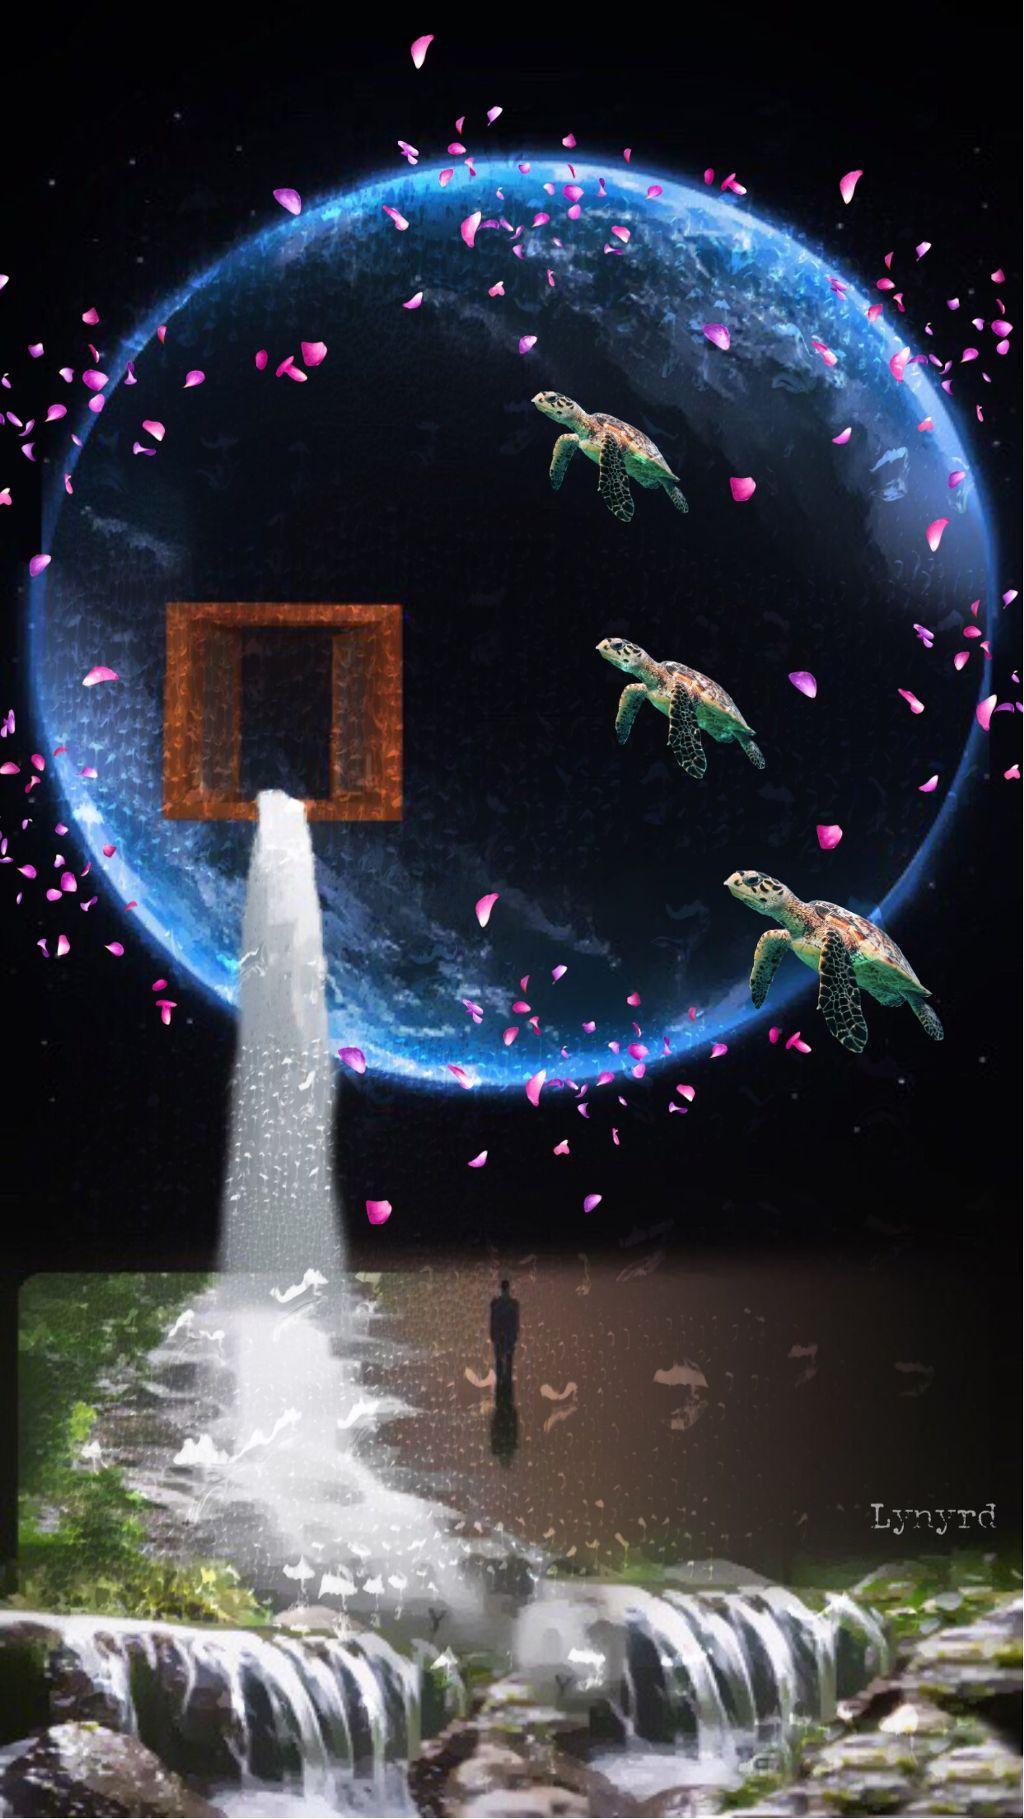 #freetoedit #fantasyart #artwork #myart #myedit #madewithpicsart #surrealart #maskeffect